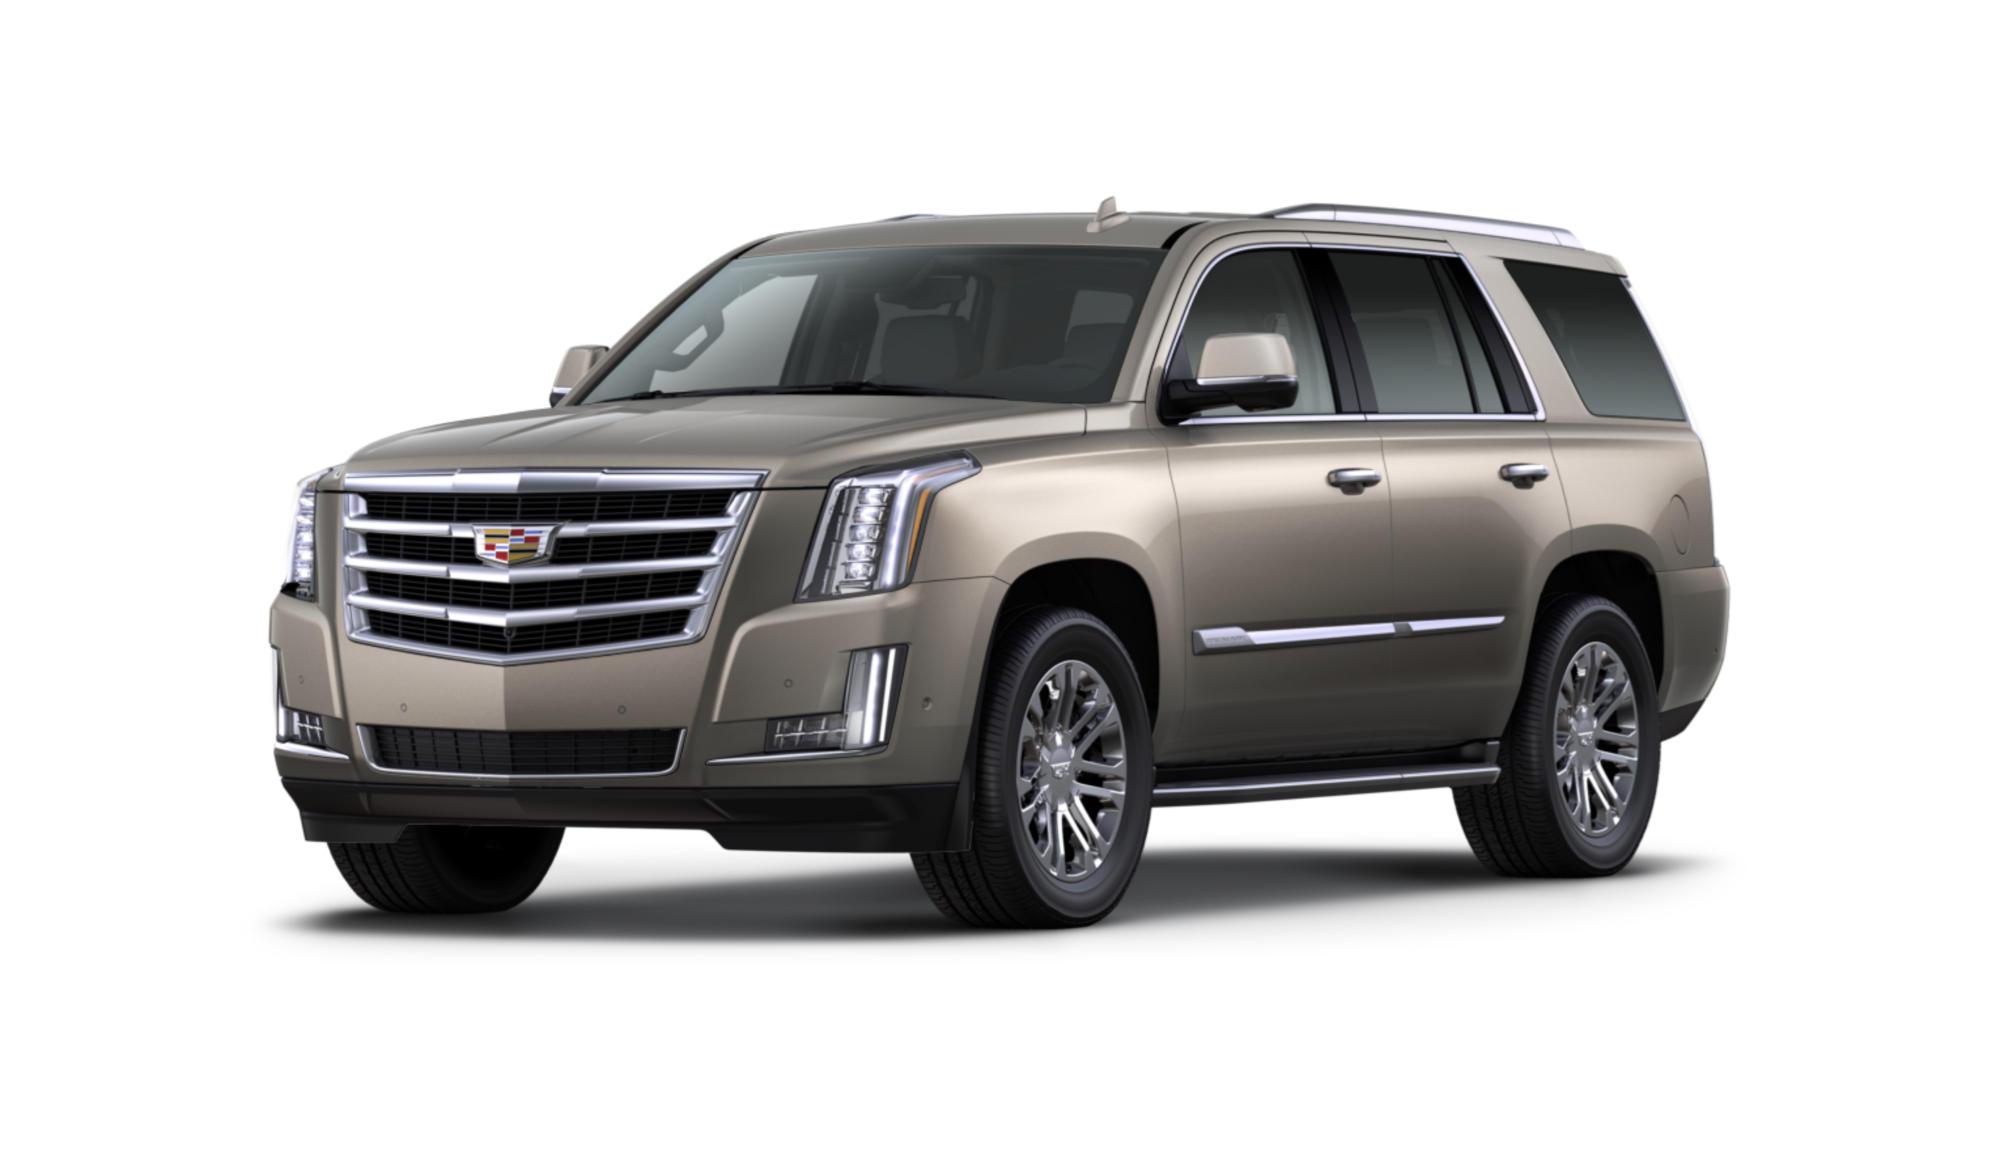 2012 Cadillac Escalade AWD 4 Door Platinum Edition Features, Specs and  Price - CarBuzz